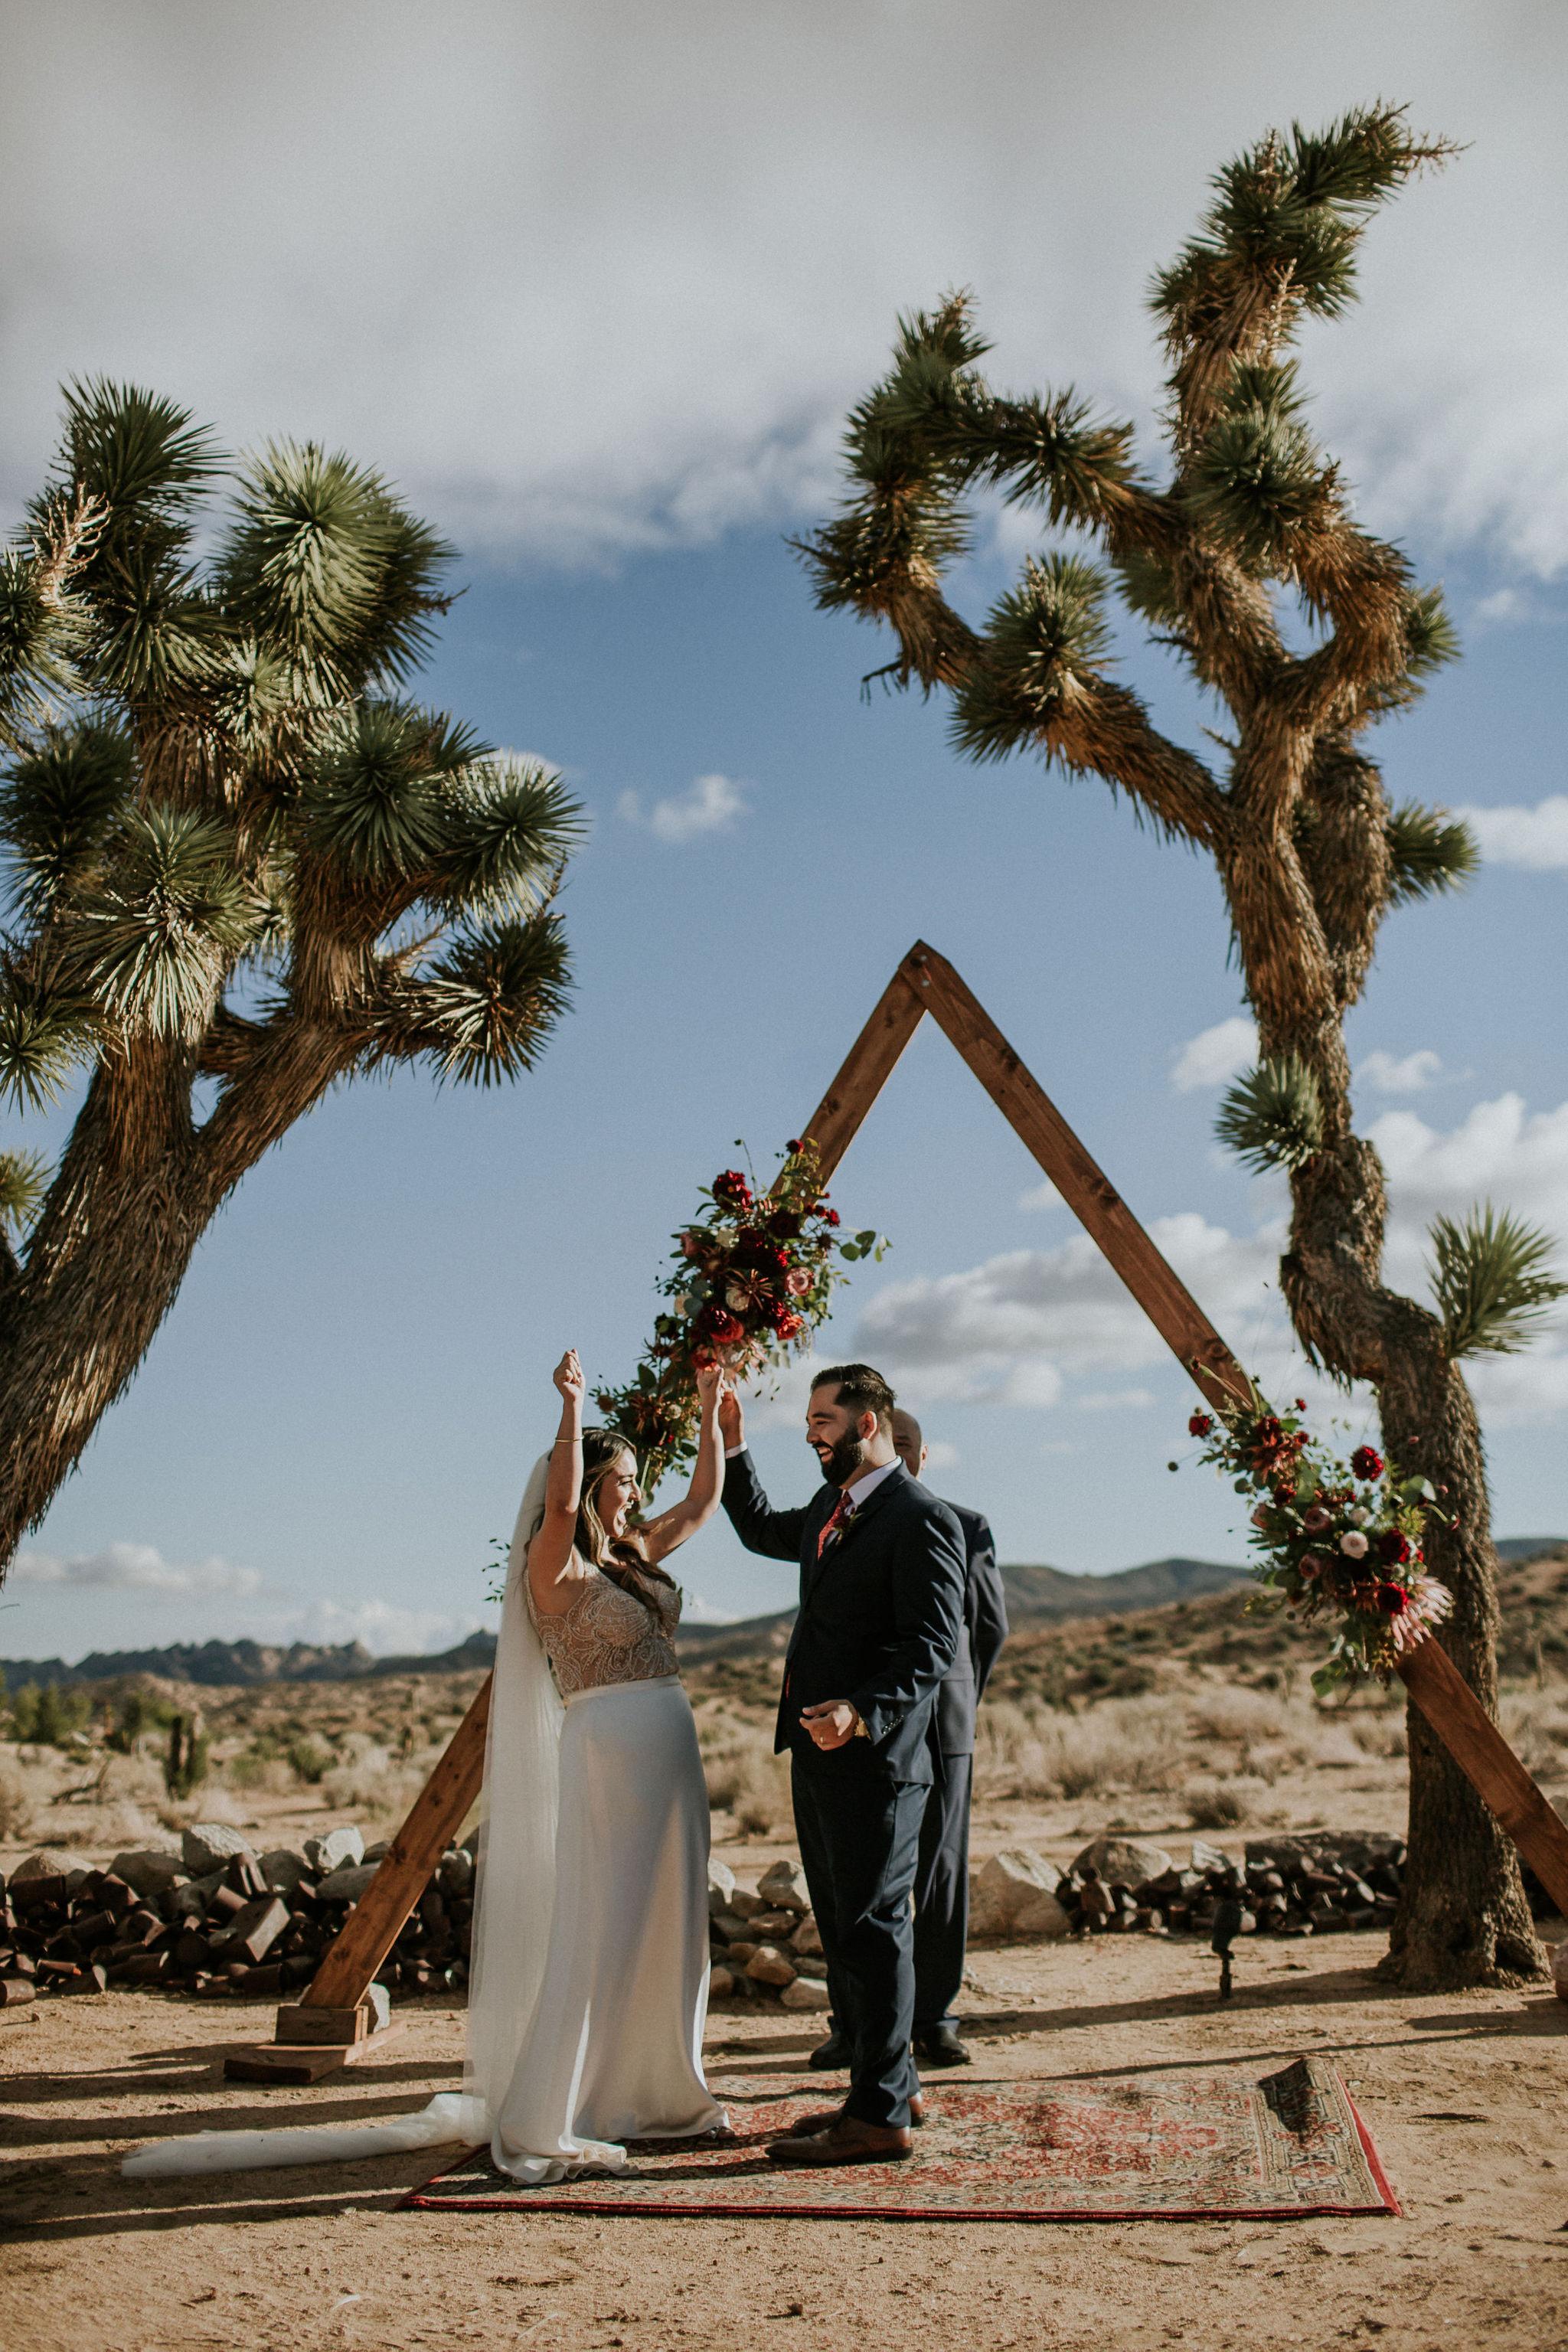 RimrockRanch-JoshuaTree-Wedding-Jami-Laree-382.jpg